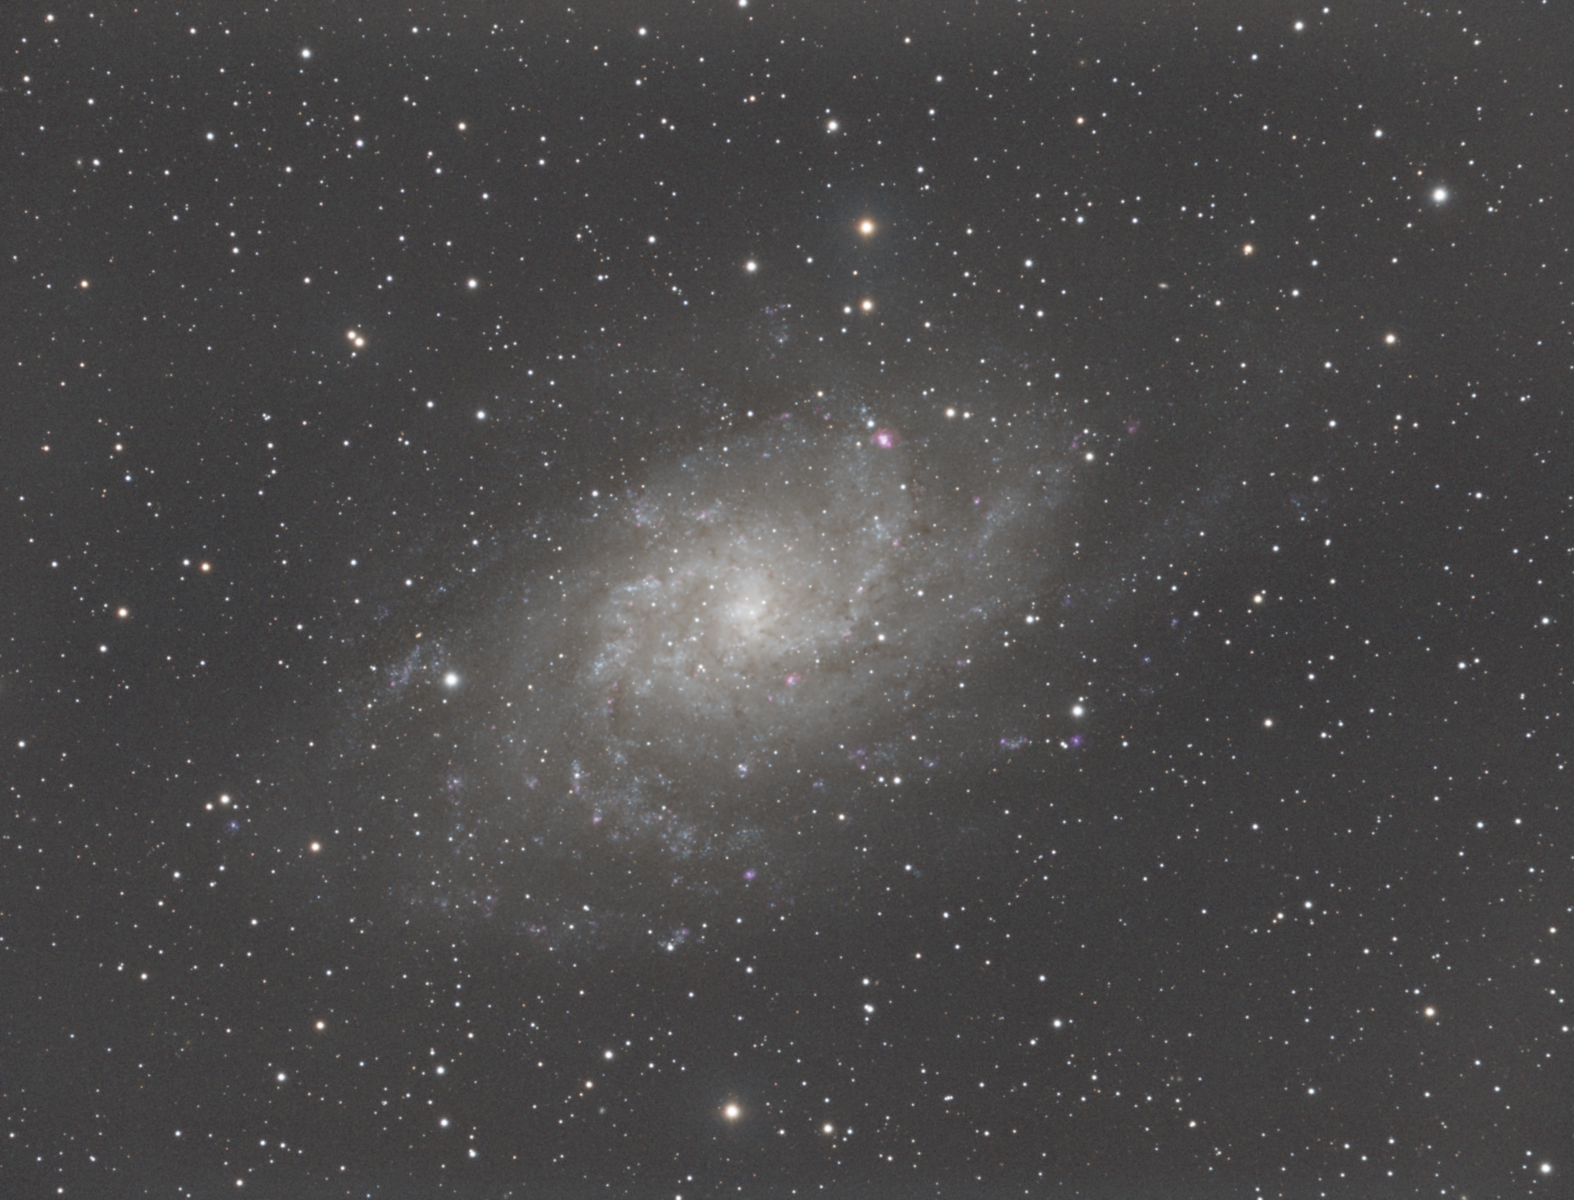 M33 - Triangulum Galaxy (First Pass)